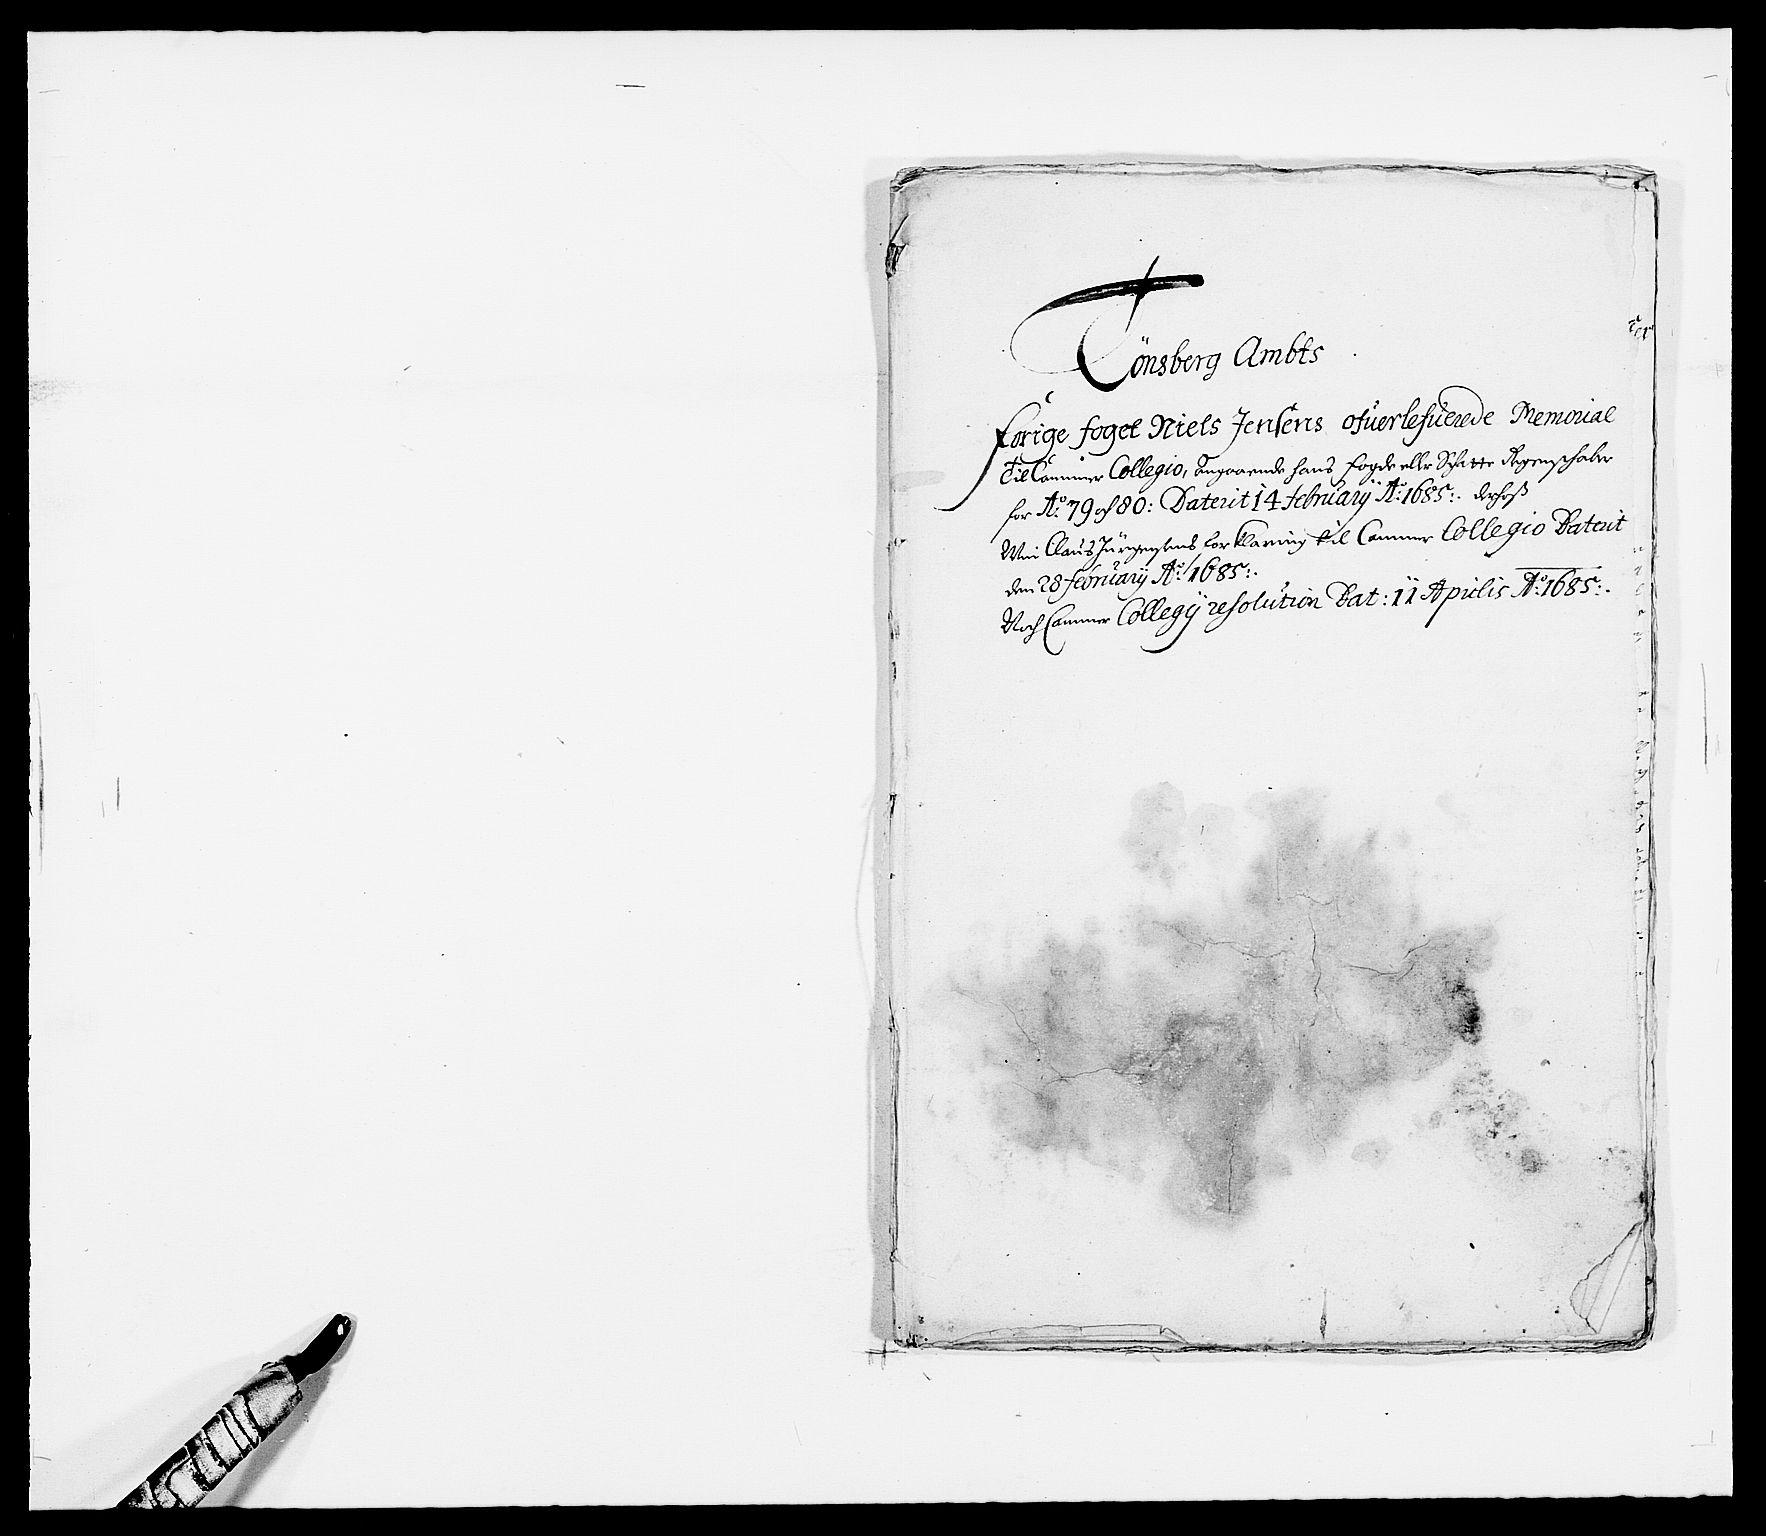 RA, Rentekammeret inntil 1814, Reviderte regnskaper, Fogderegnskap, R32/L1849: Fogderegnskap Jarlsberg grevskap, 1679-1680, s. 91